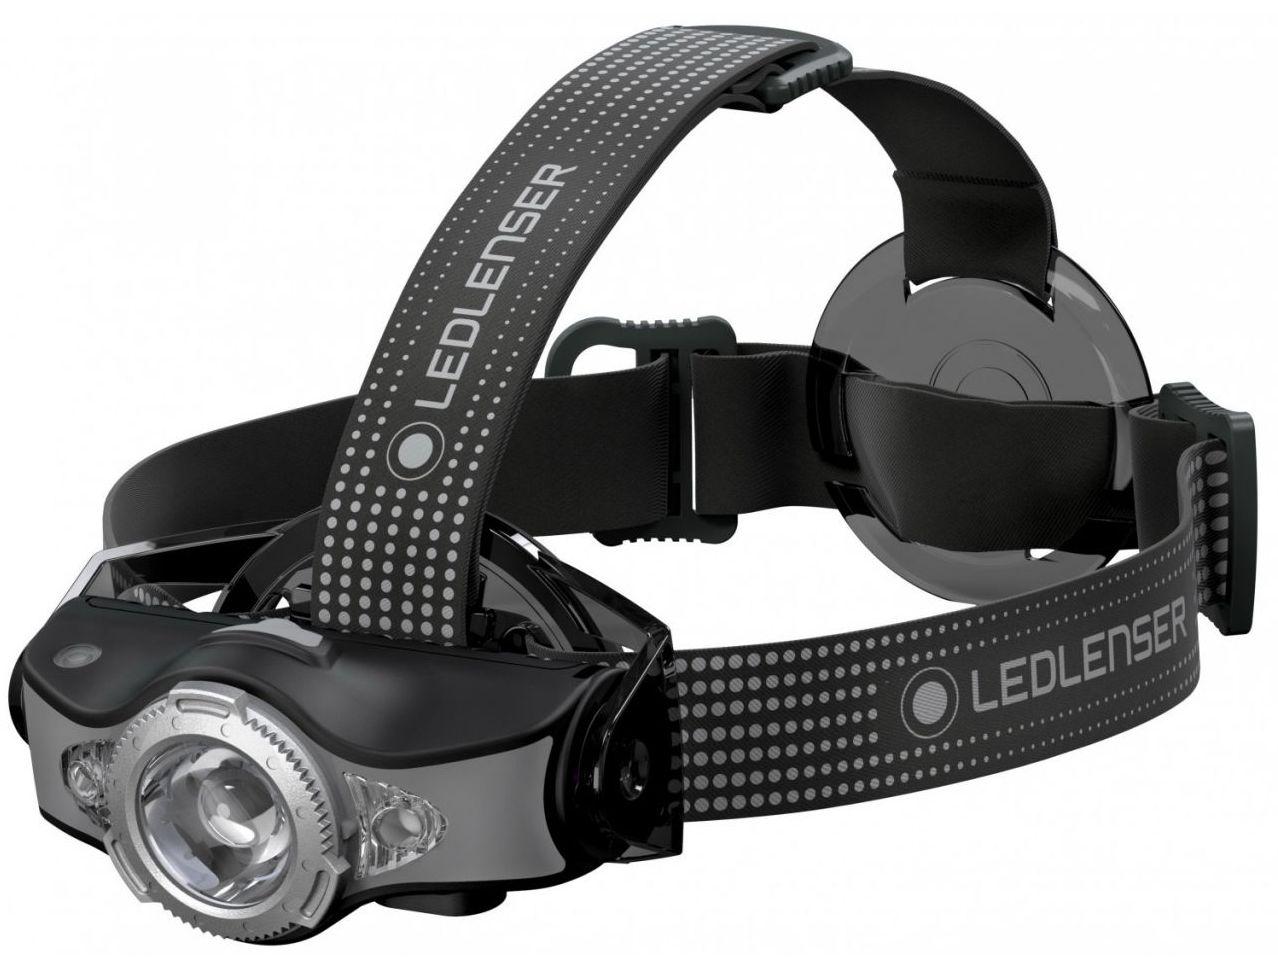 Налобный фонарь Led Lenser MH11 Outdoor Black&Gray (500996)